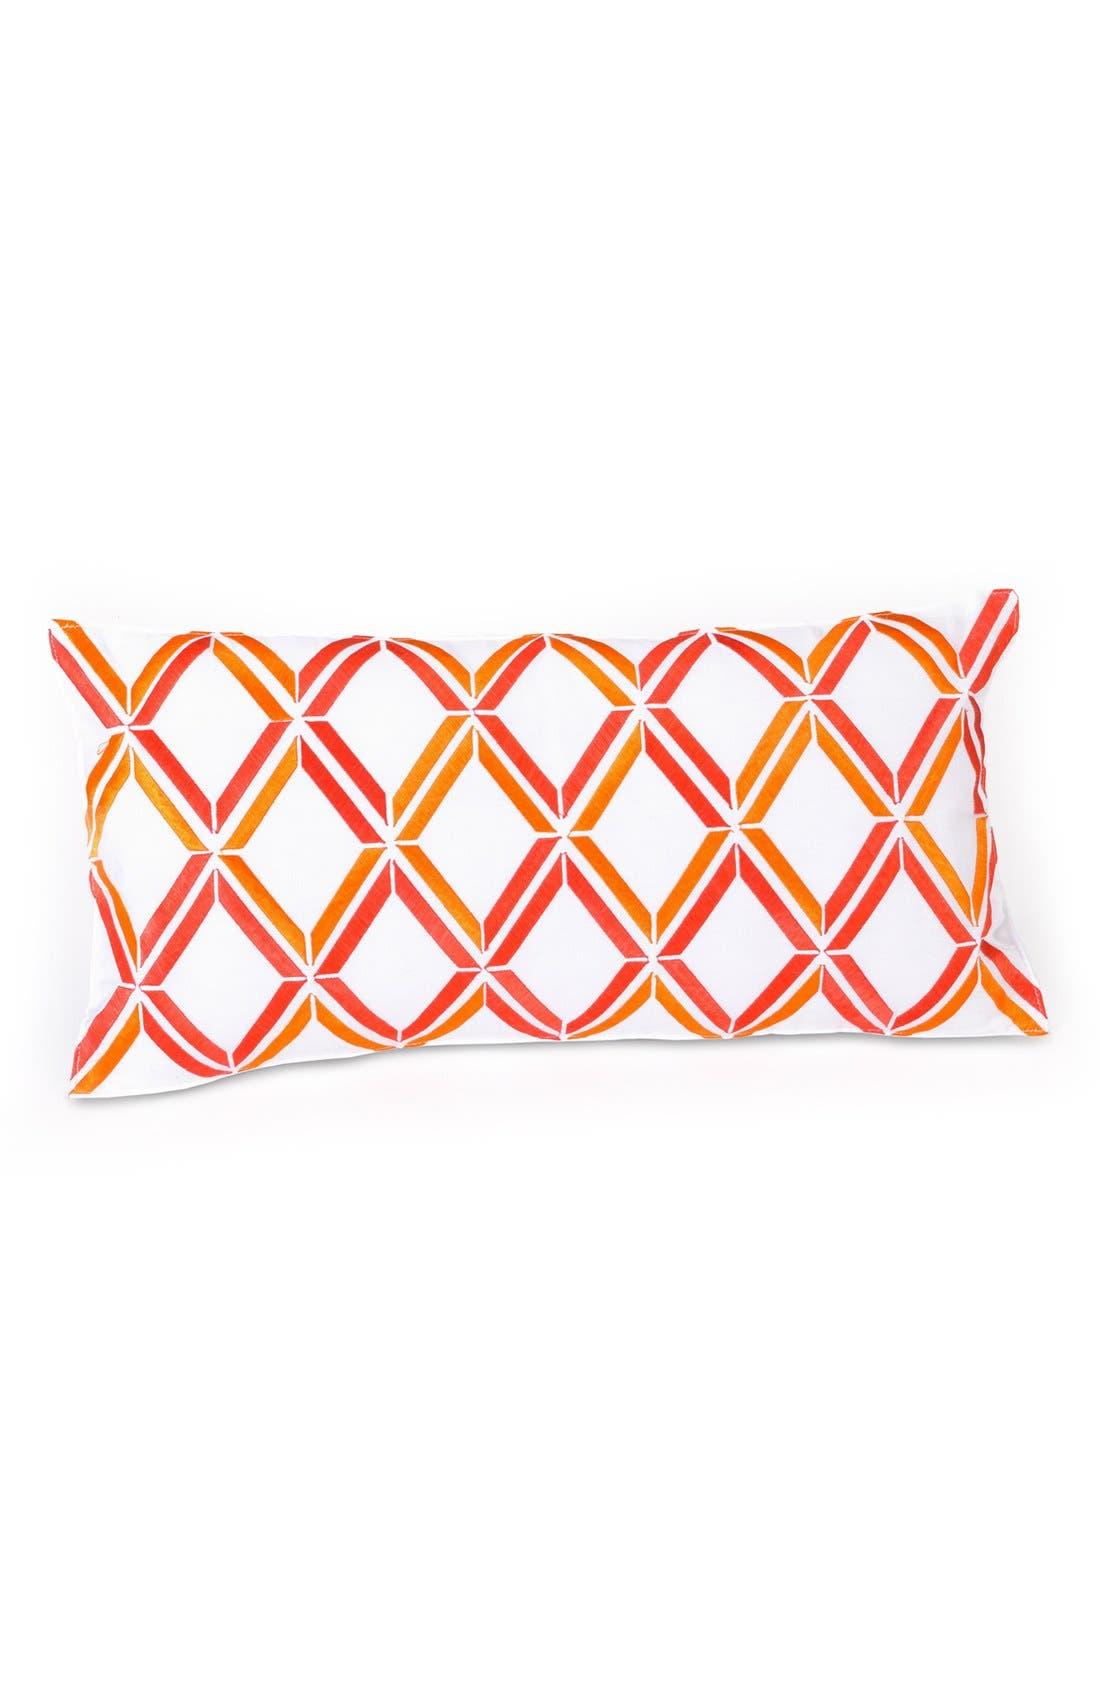 Alternate Image 1 Selected - Trina Turk 'Peacock Punch - Diamond' Pillow